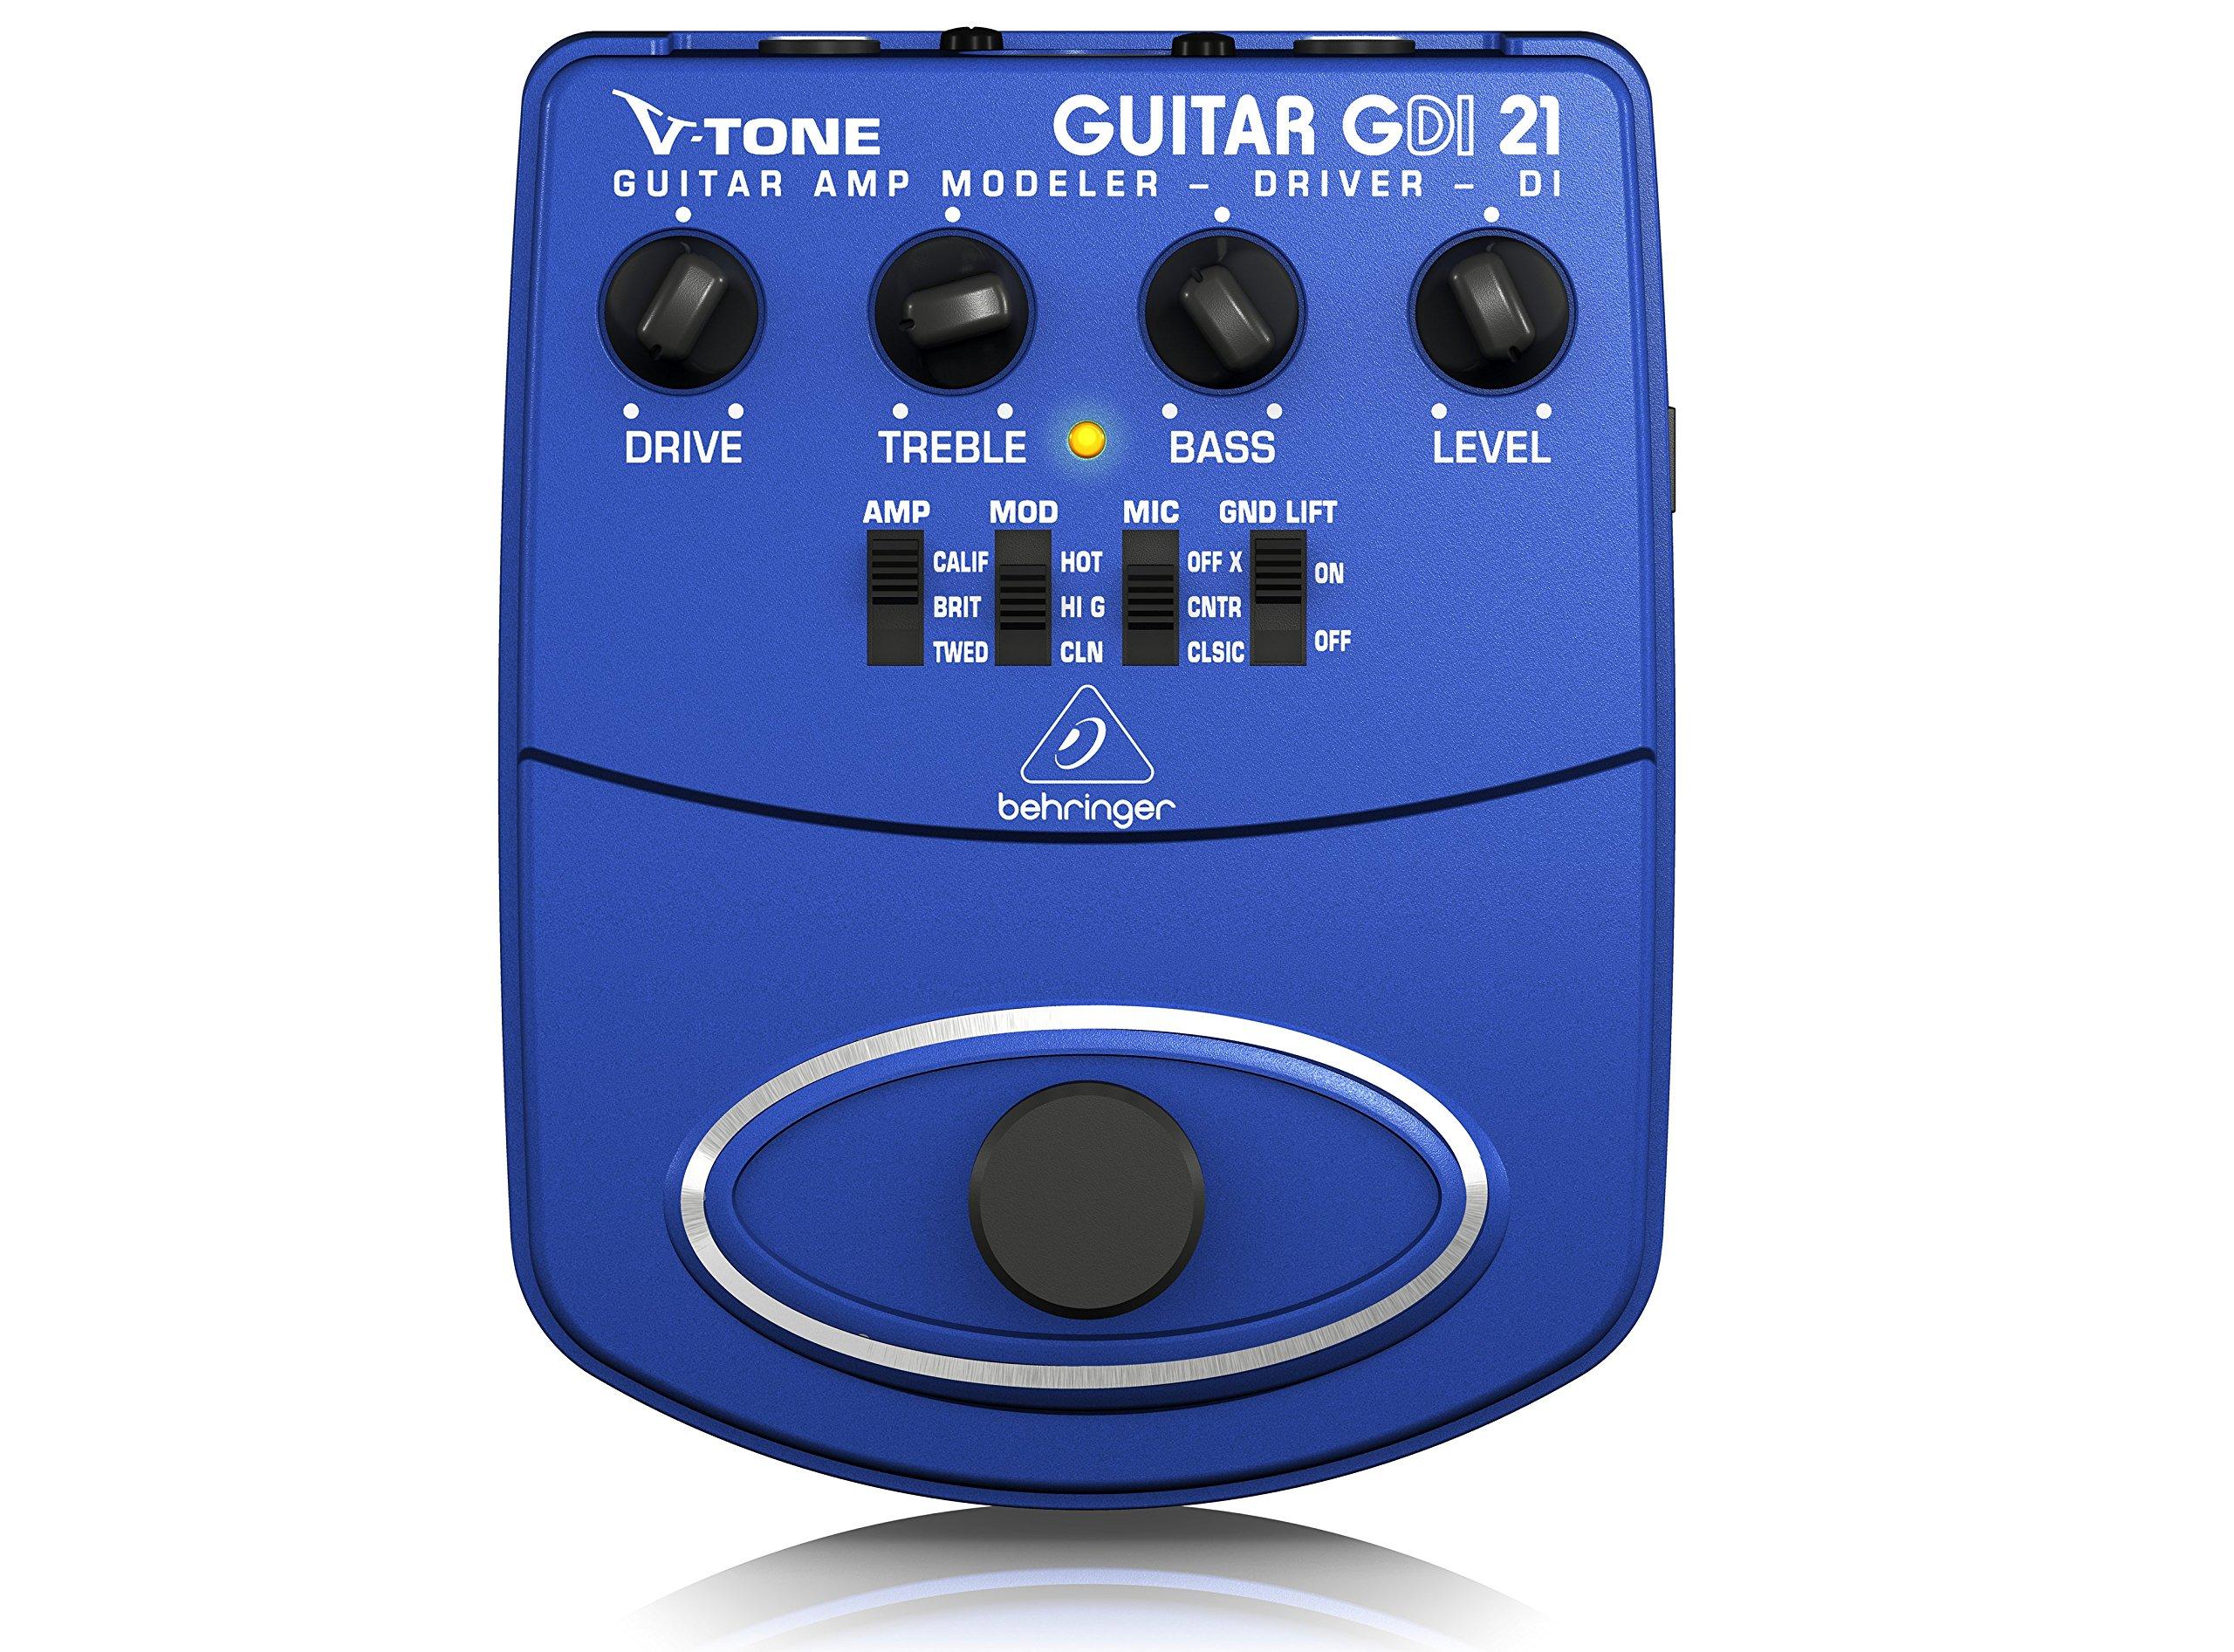 Behringer Guitar Link UCG102 USB Interface Review